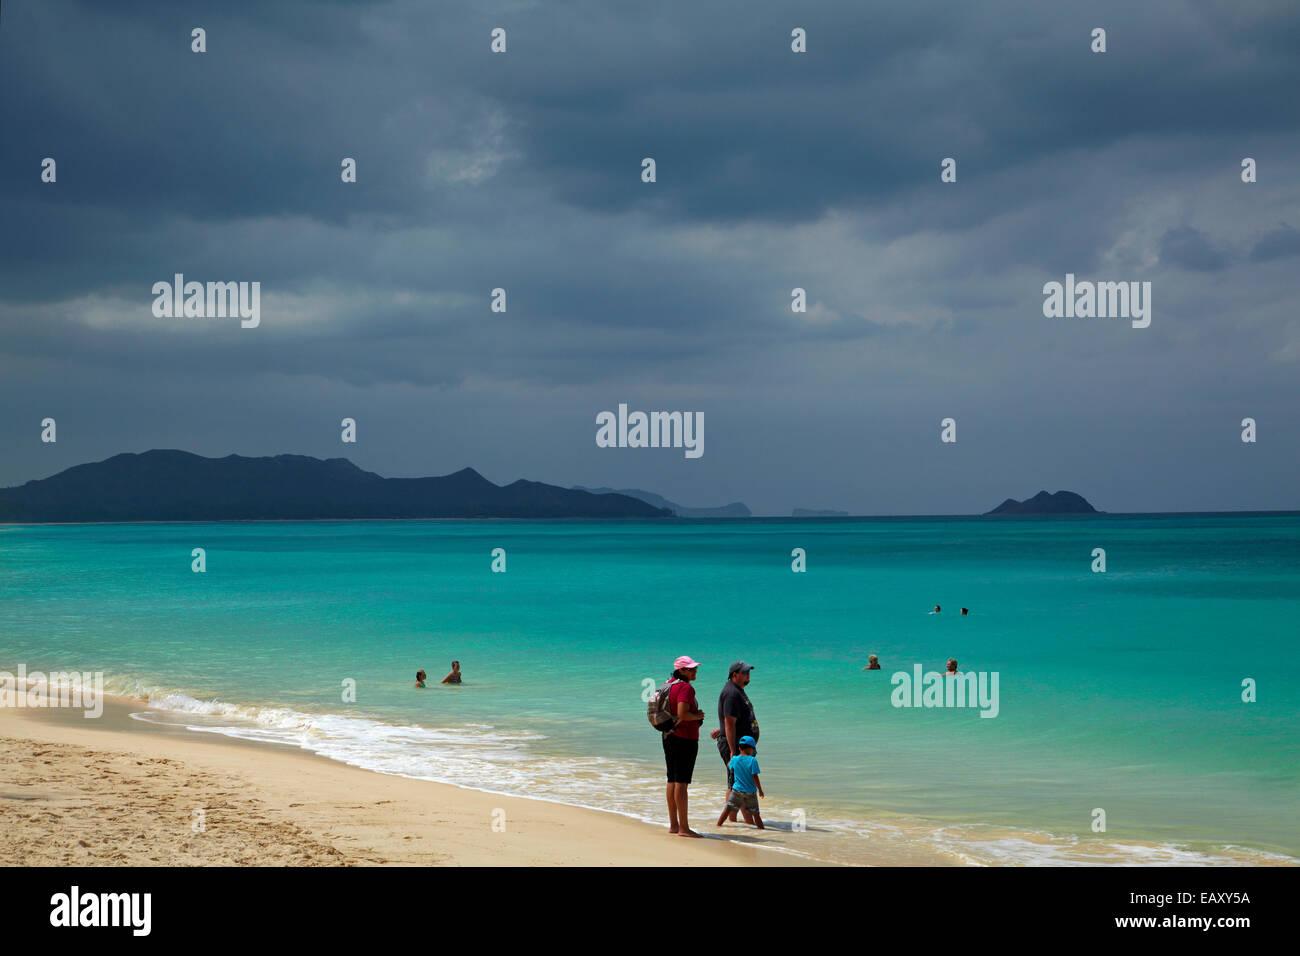 People swimming at Waimanalo Beach, and storm clouds, Oahu, Hawaii, USA - Stock Image